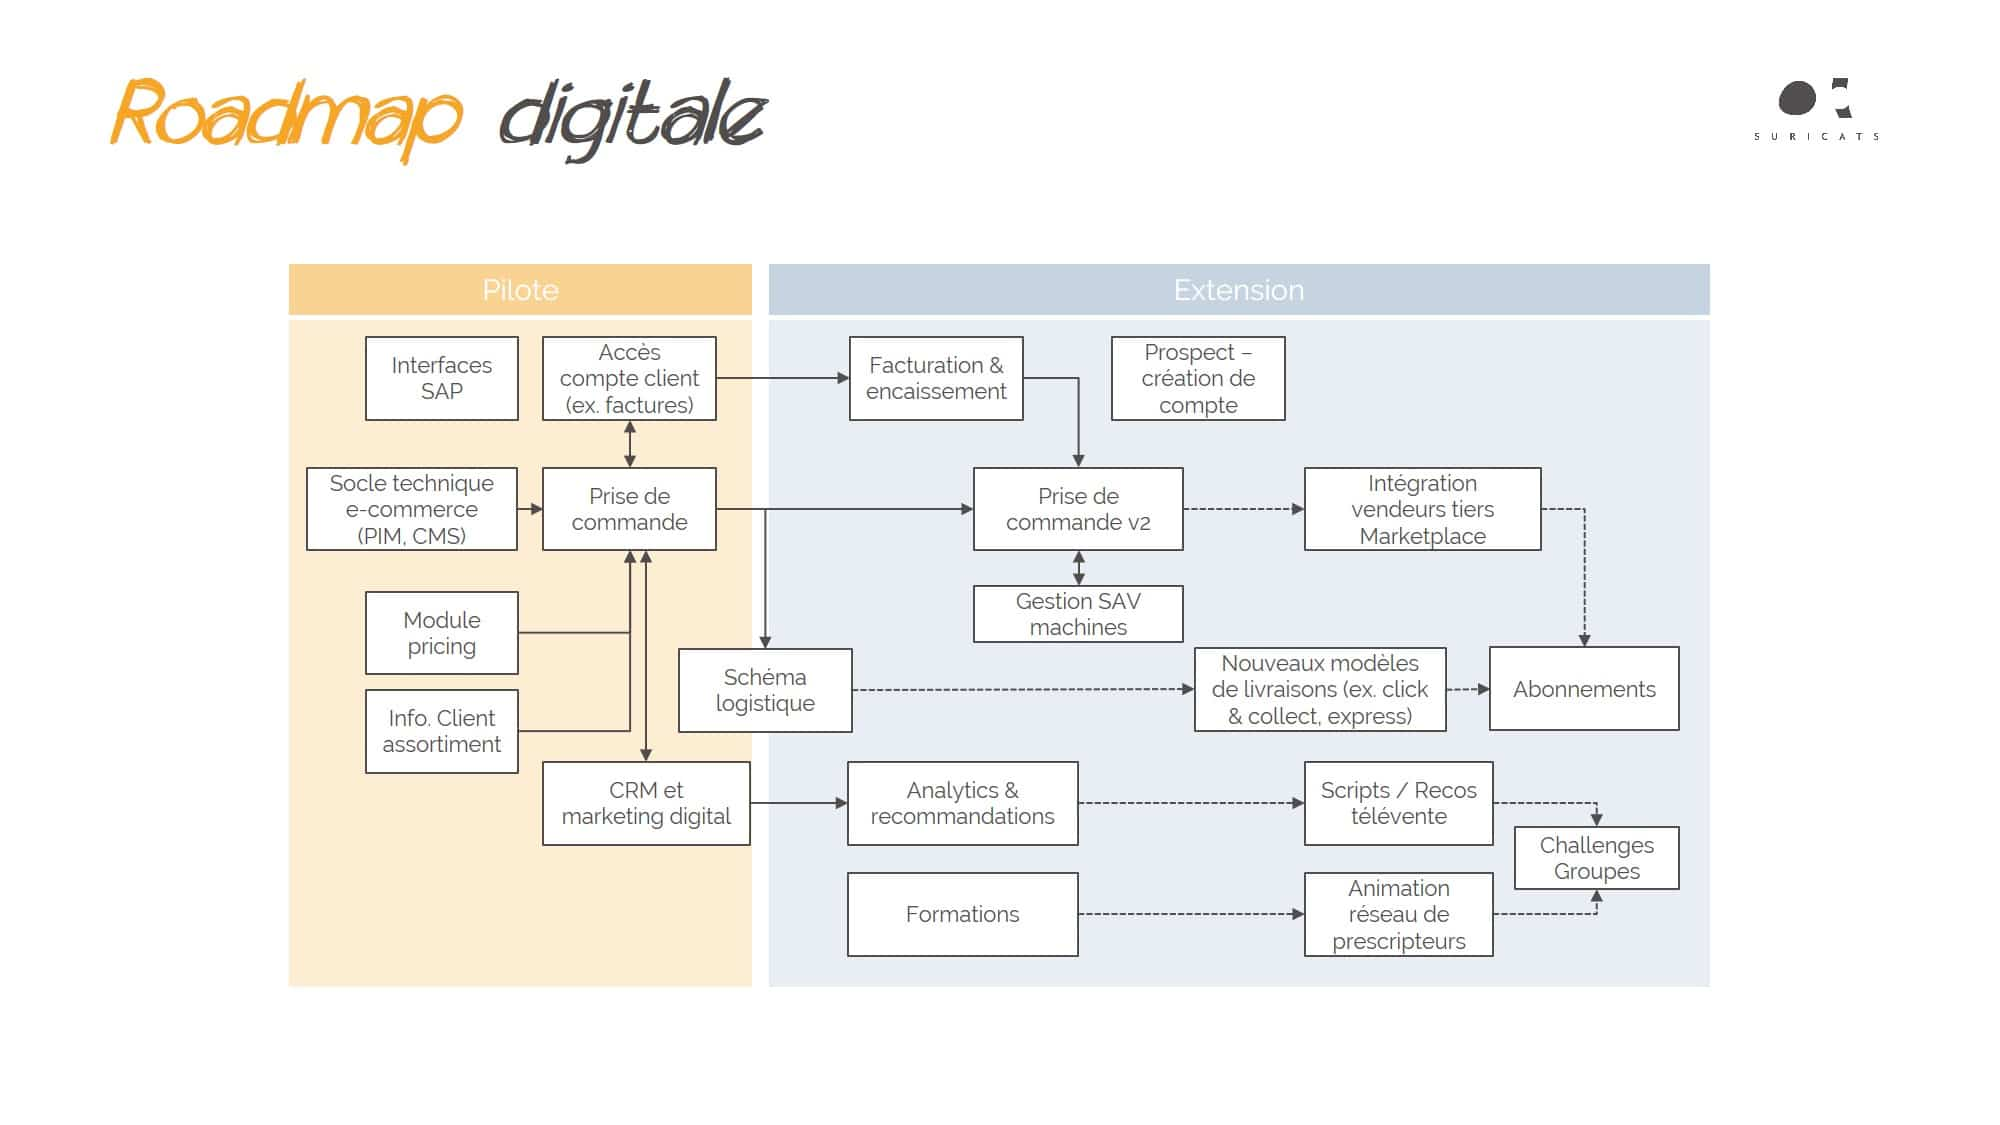 digital business B2B - roadmap digitale